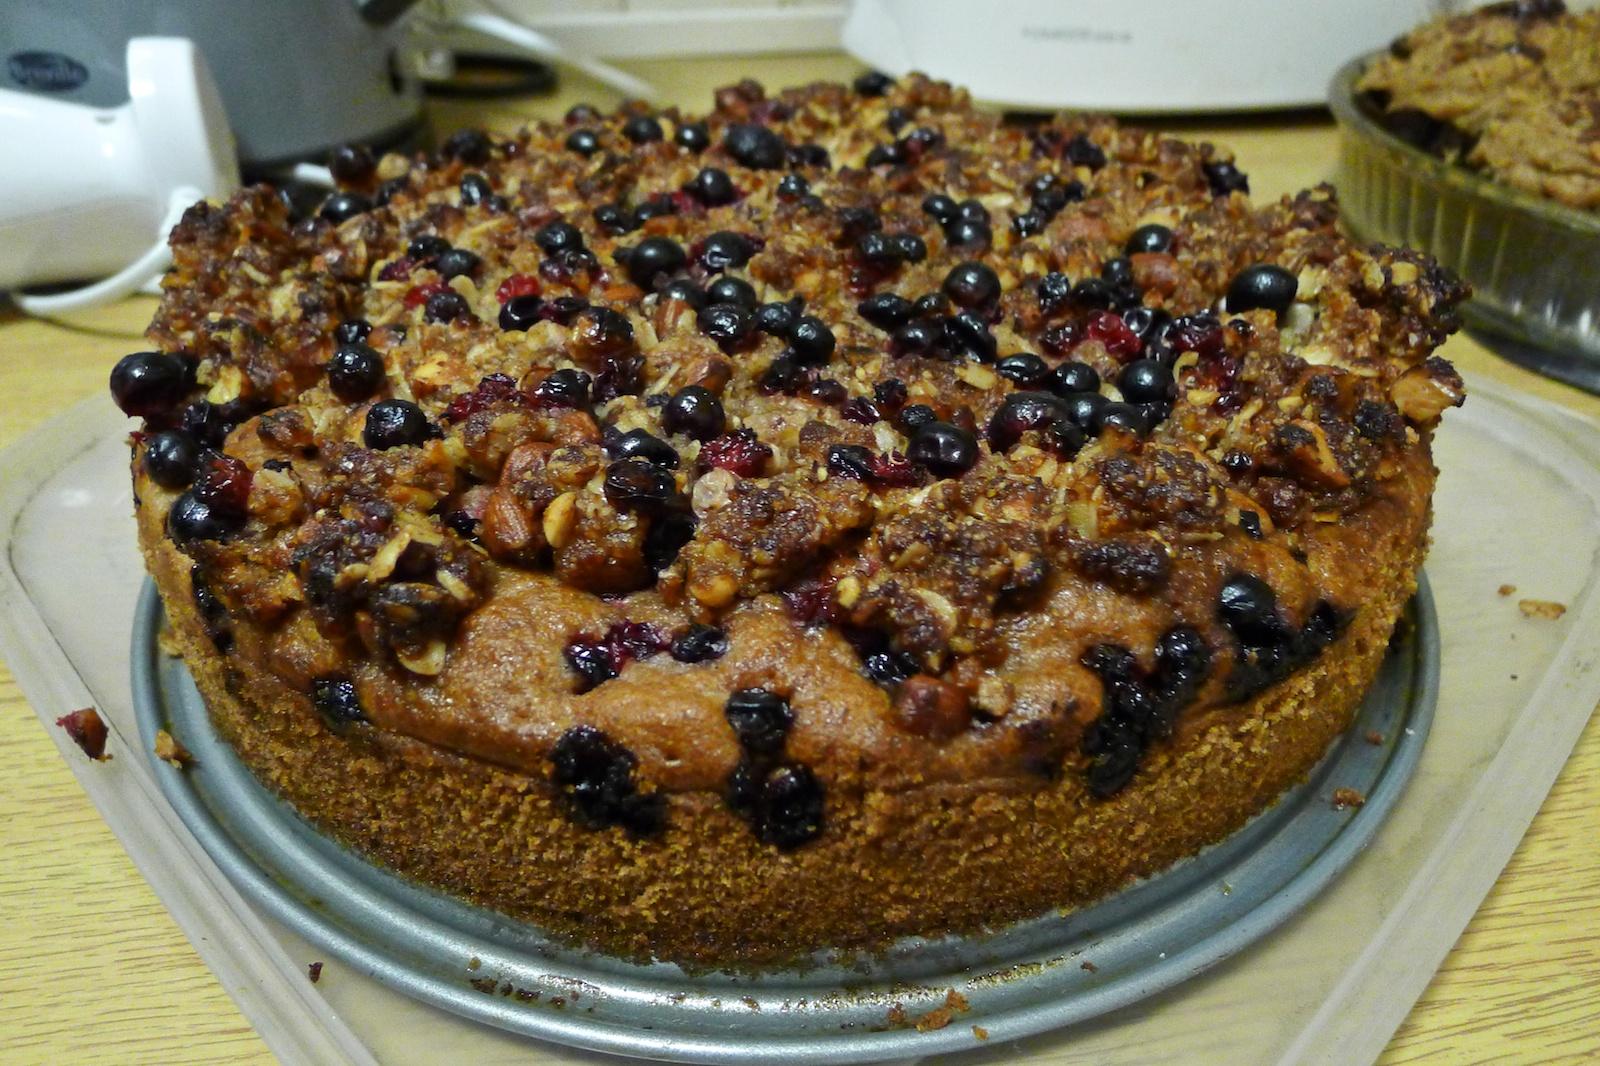 Vegan Cake Recipes Uk: Cambridge CropShare